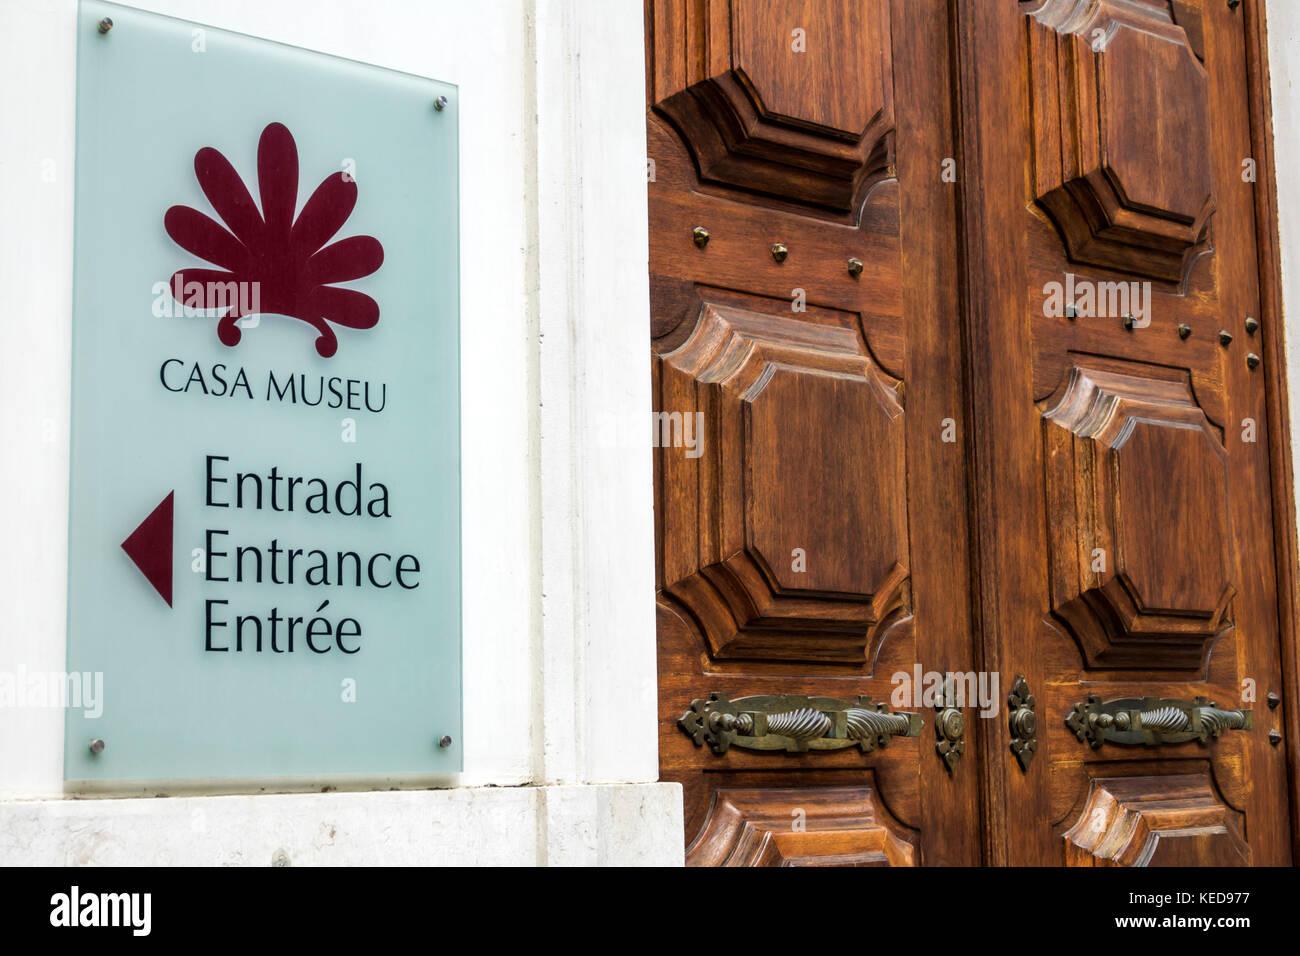 Lisbon Portugal Casa Museu Medeiros e Almeida museum historic mansion entrance sign door French English Spanish - Stock Image